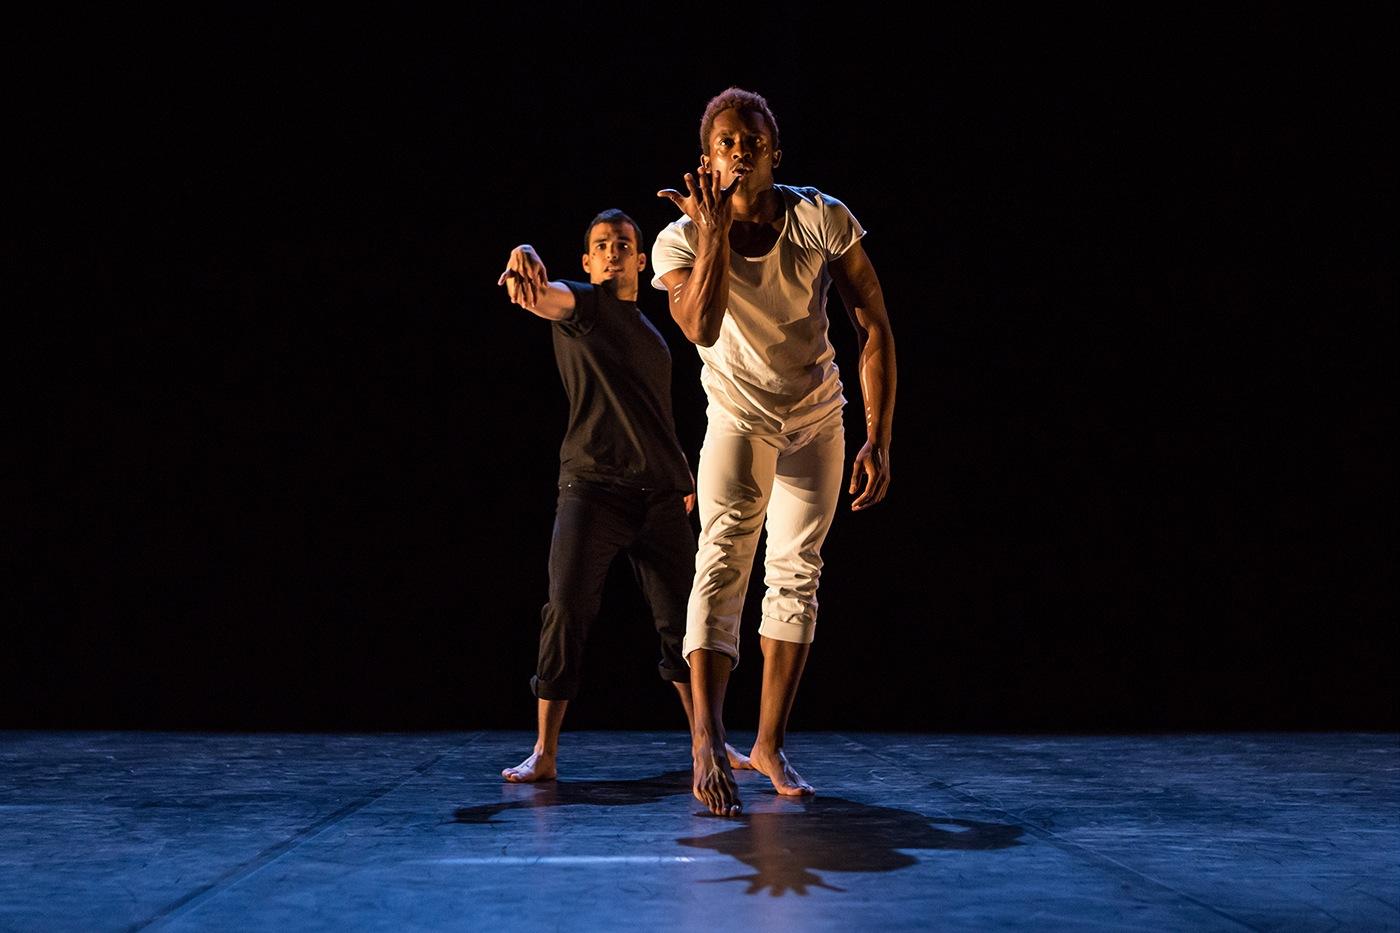 photographe-reportage-danse-avec-ton-crous-guillaume-heraud-029-small